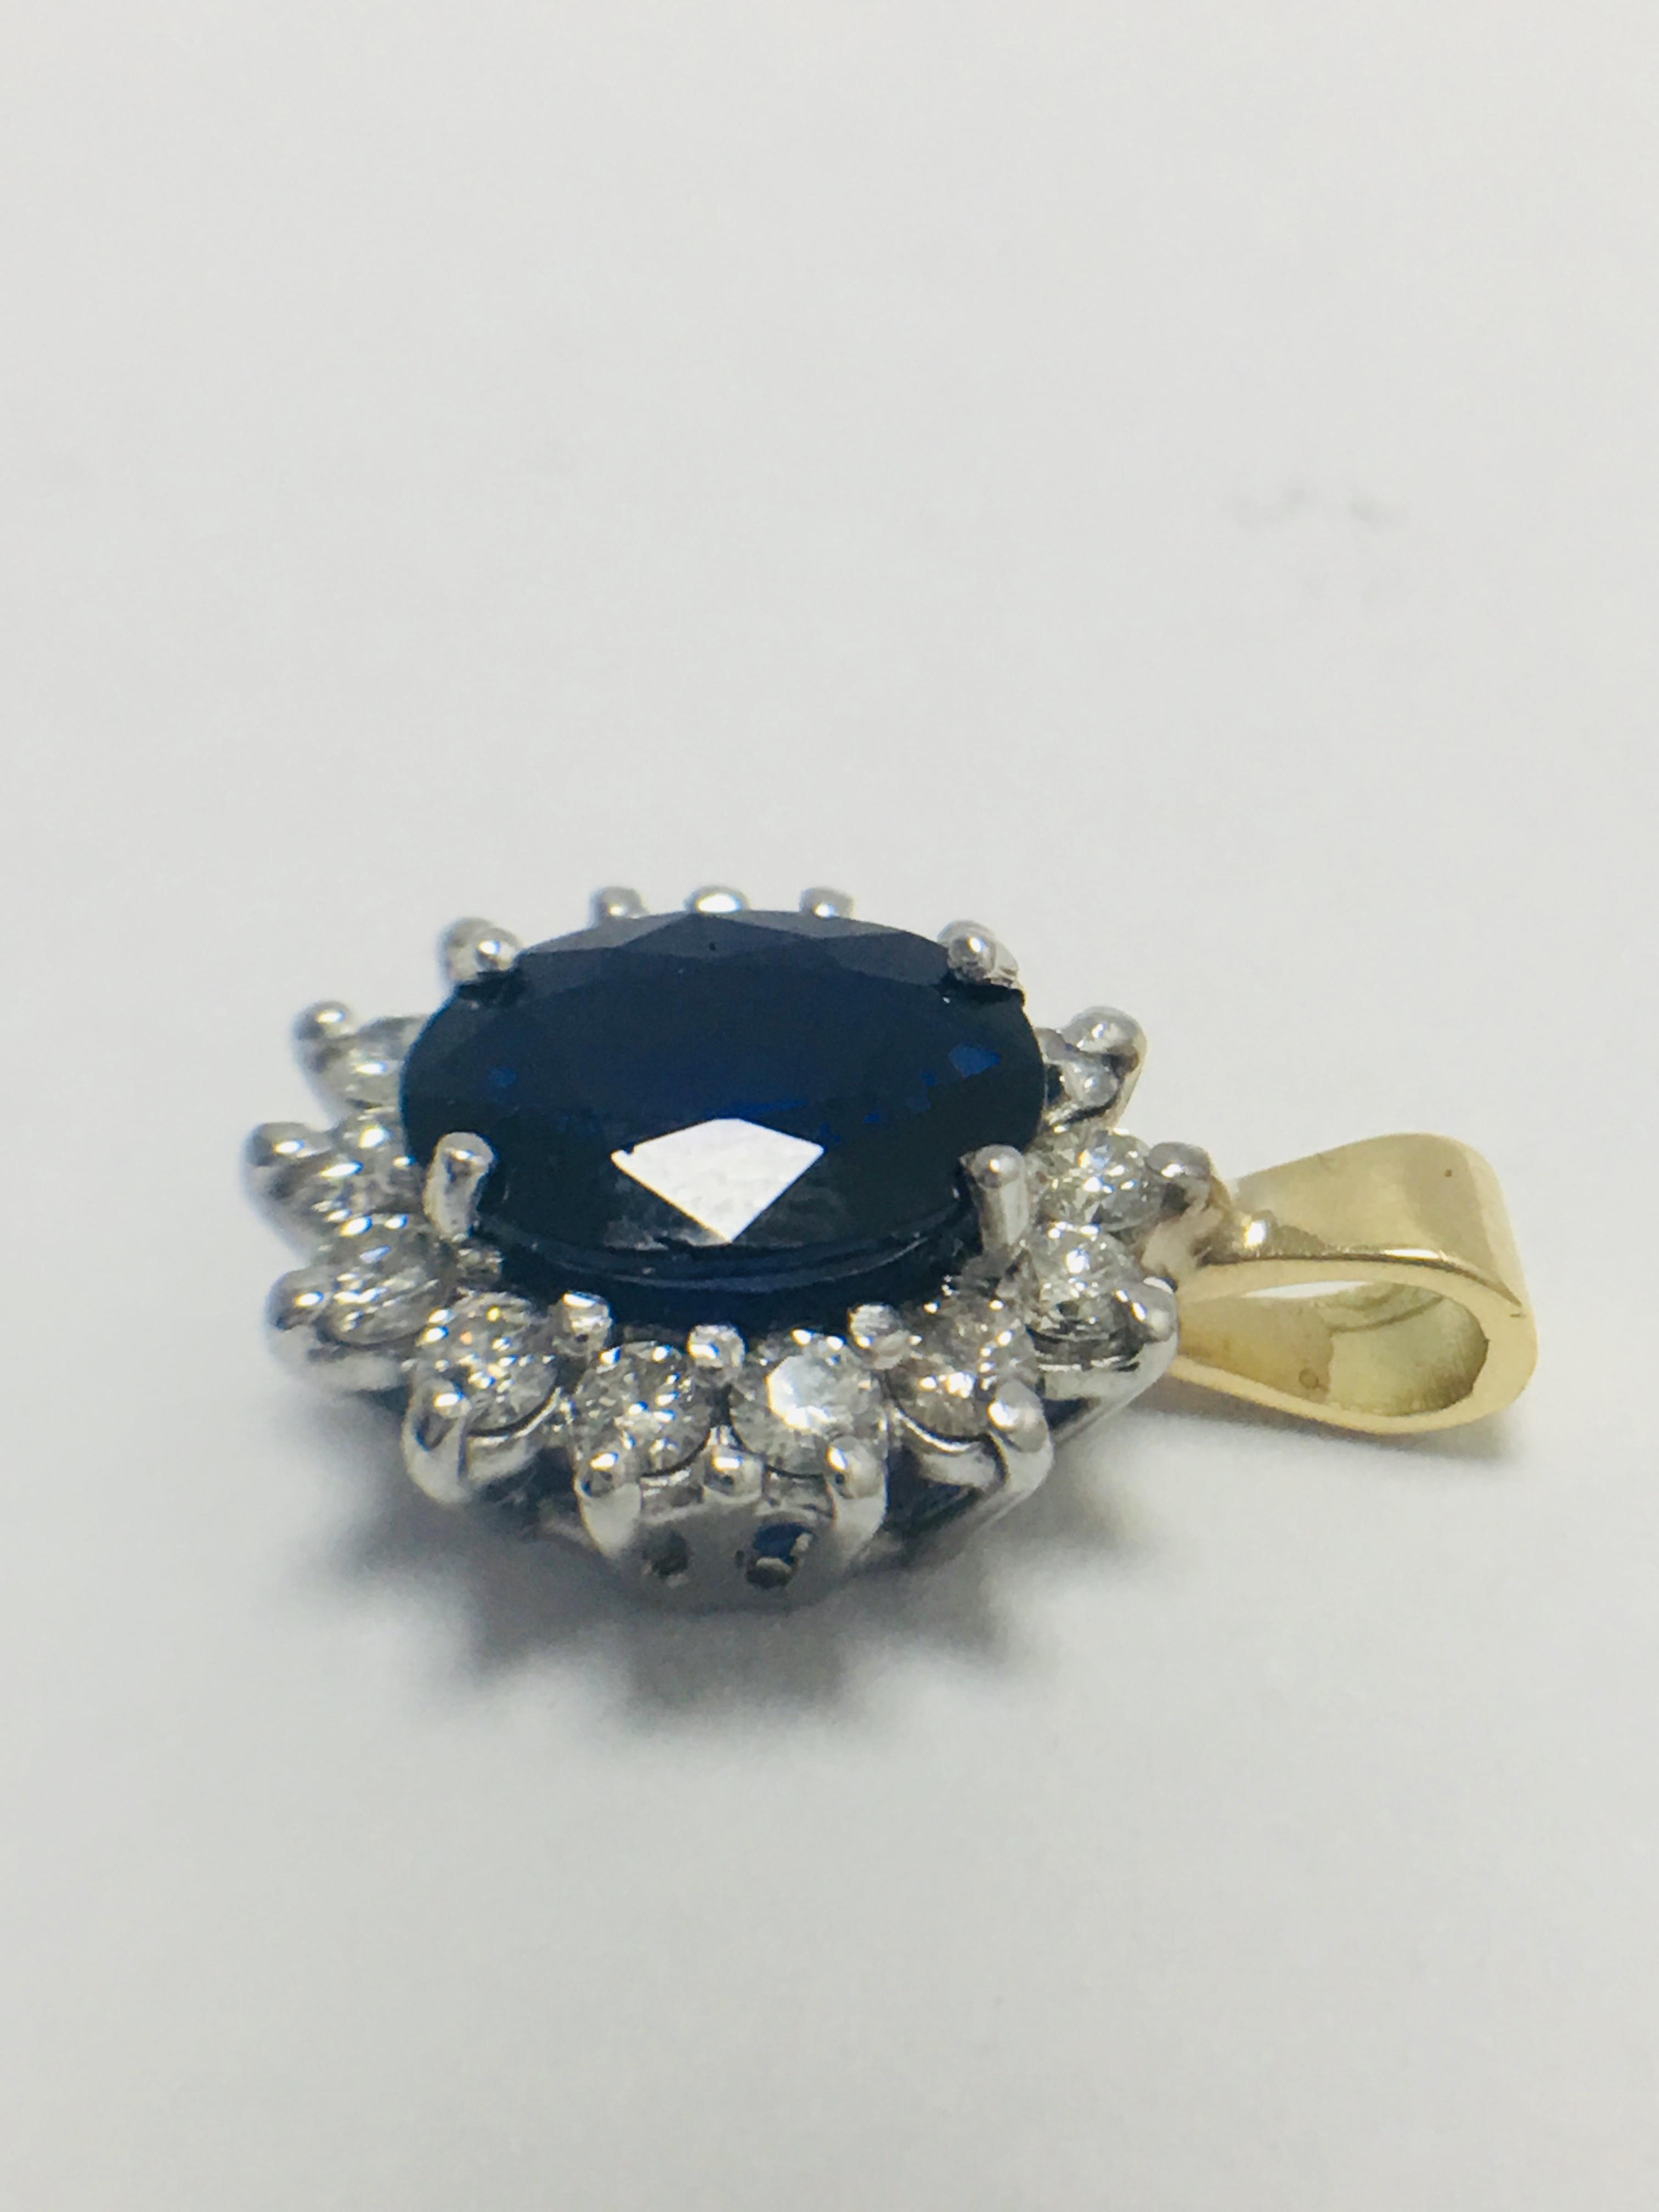 Sapphire and Diamond pendant,18ct gold - Image 6 of 7